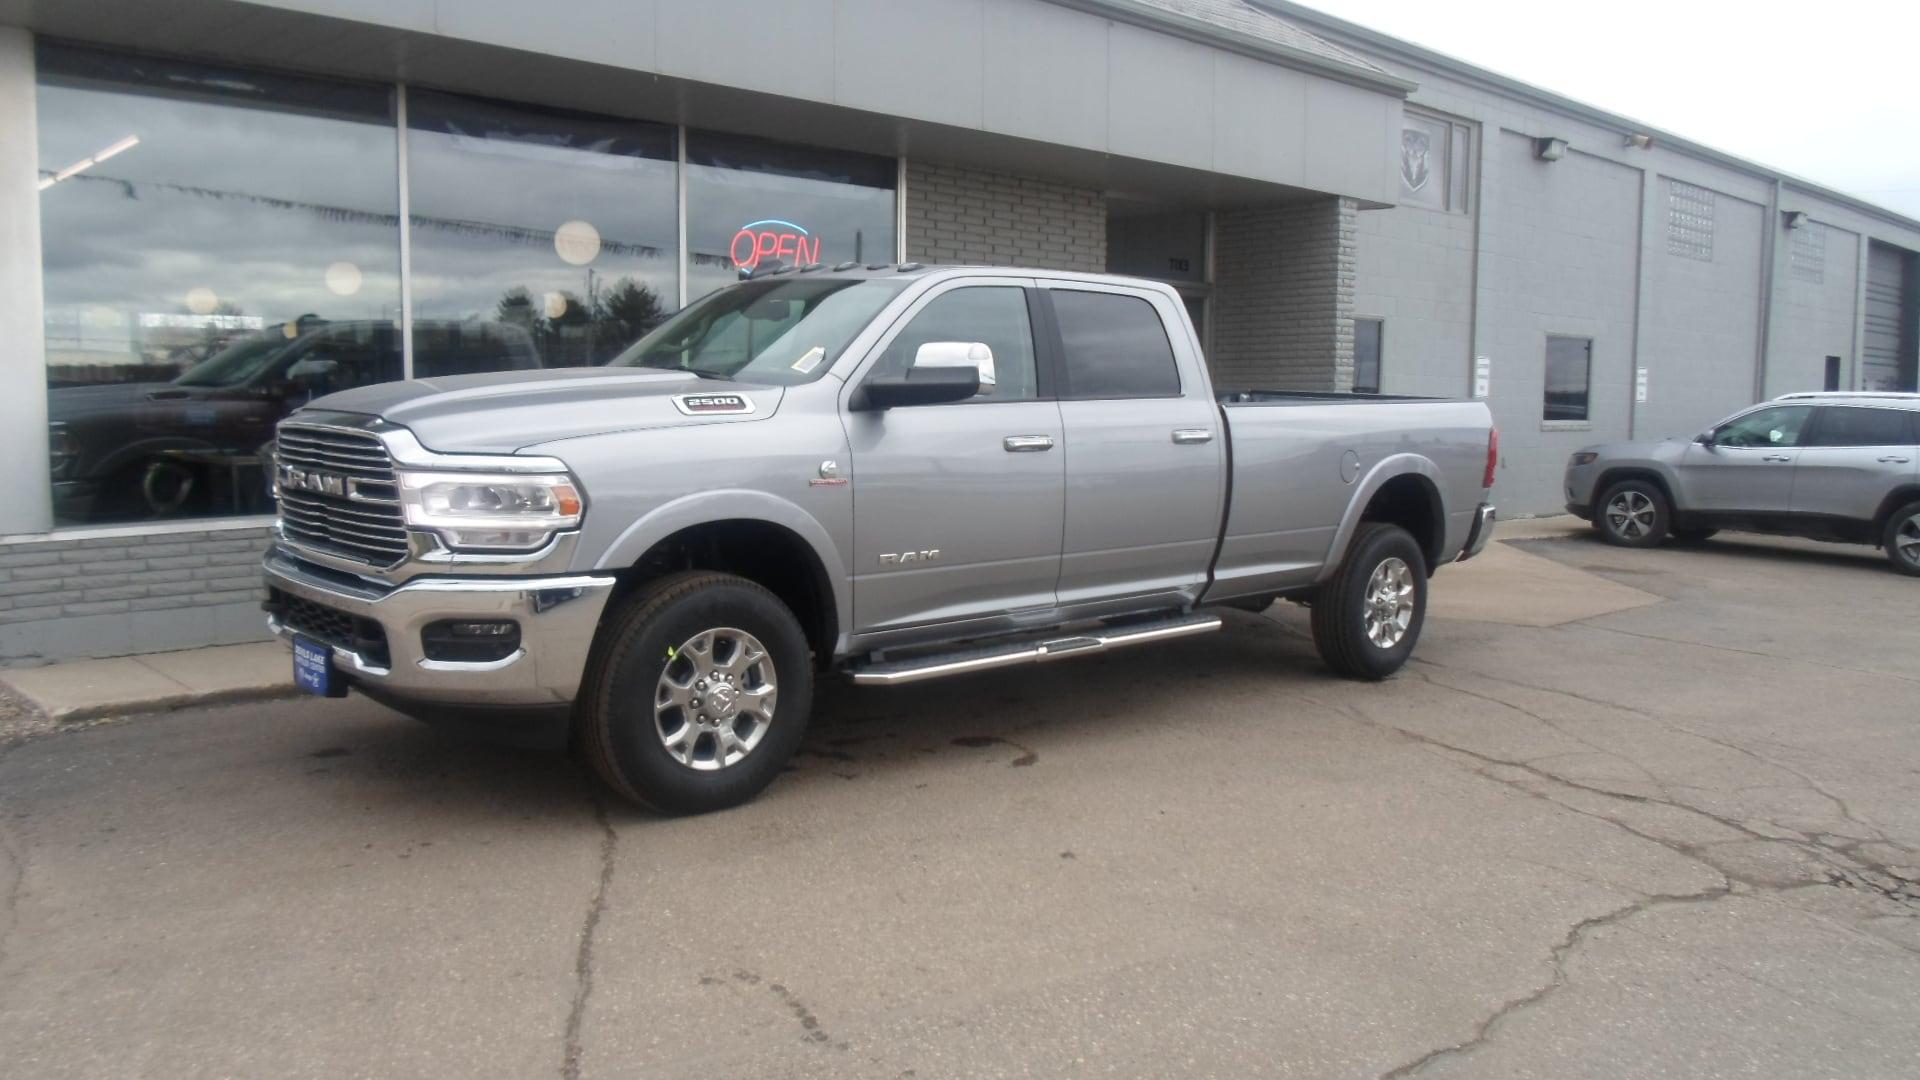 4X4 For Sale >> New 2019 Ram 2500 Laramie Crew Cab 4x4 8 Box For Sale In Devils Lake Nd Near Grand Forks Fargo Bismarck Nd Vin 3c6ur5kl3kg557387